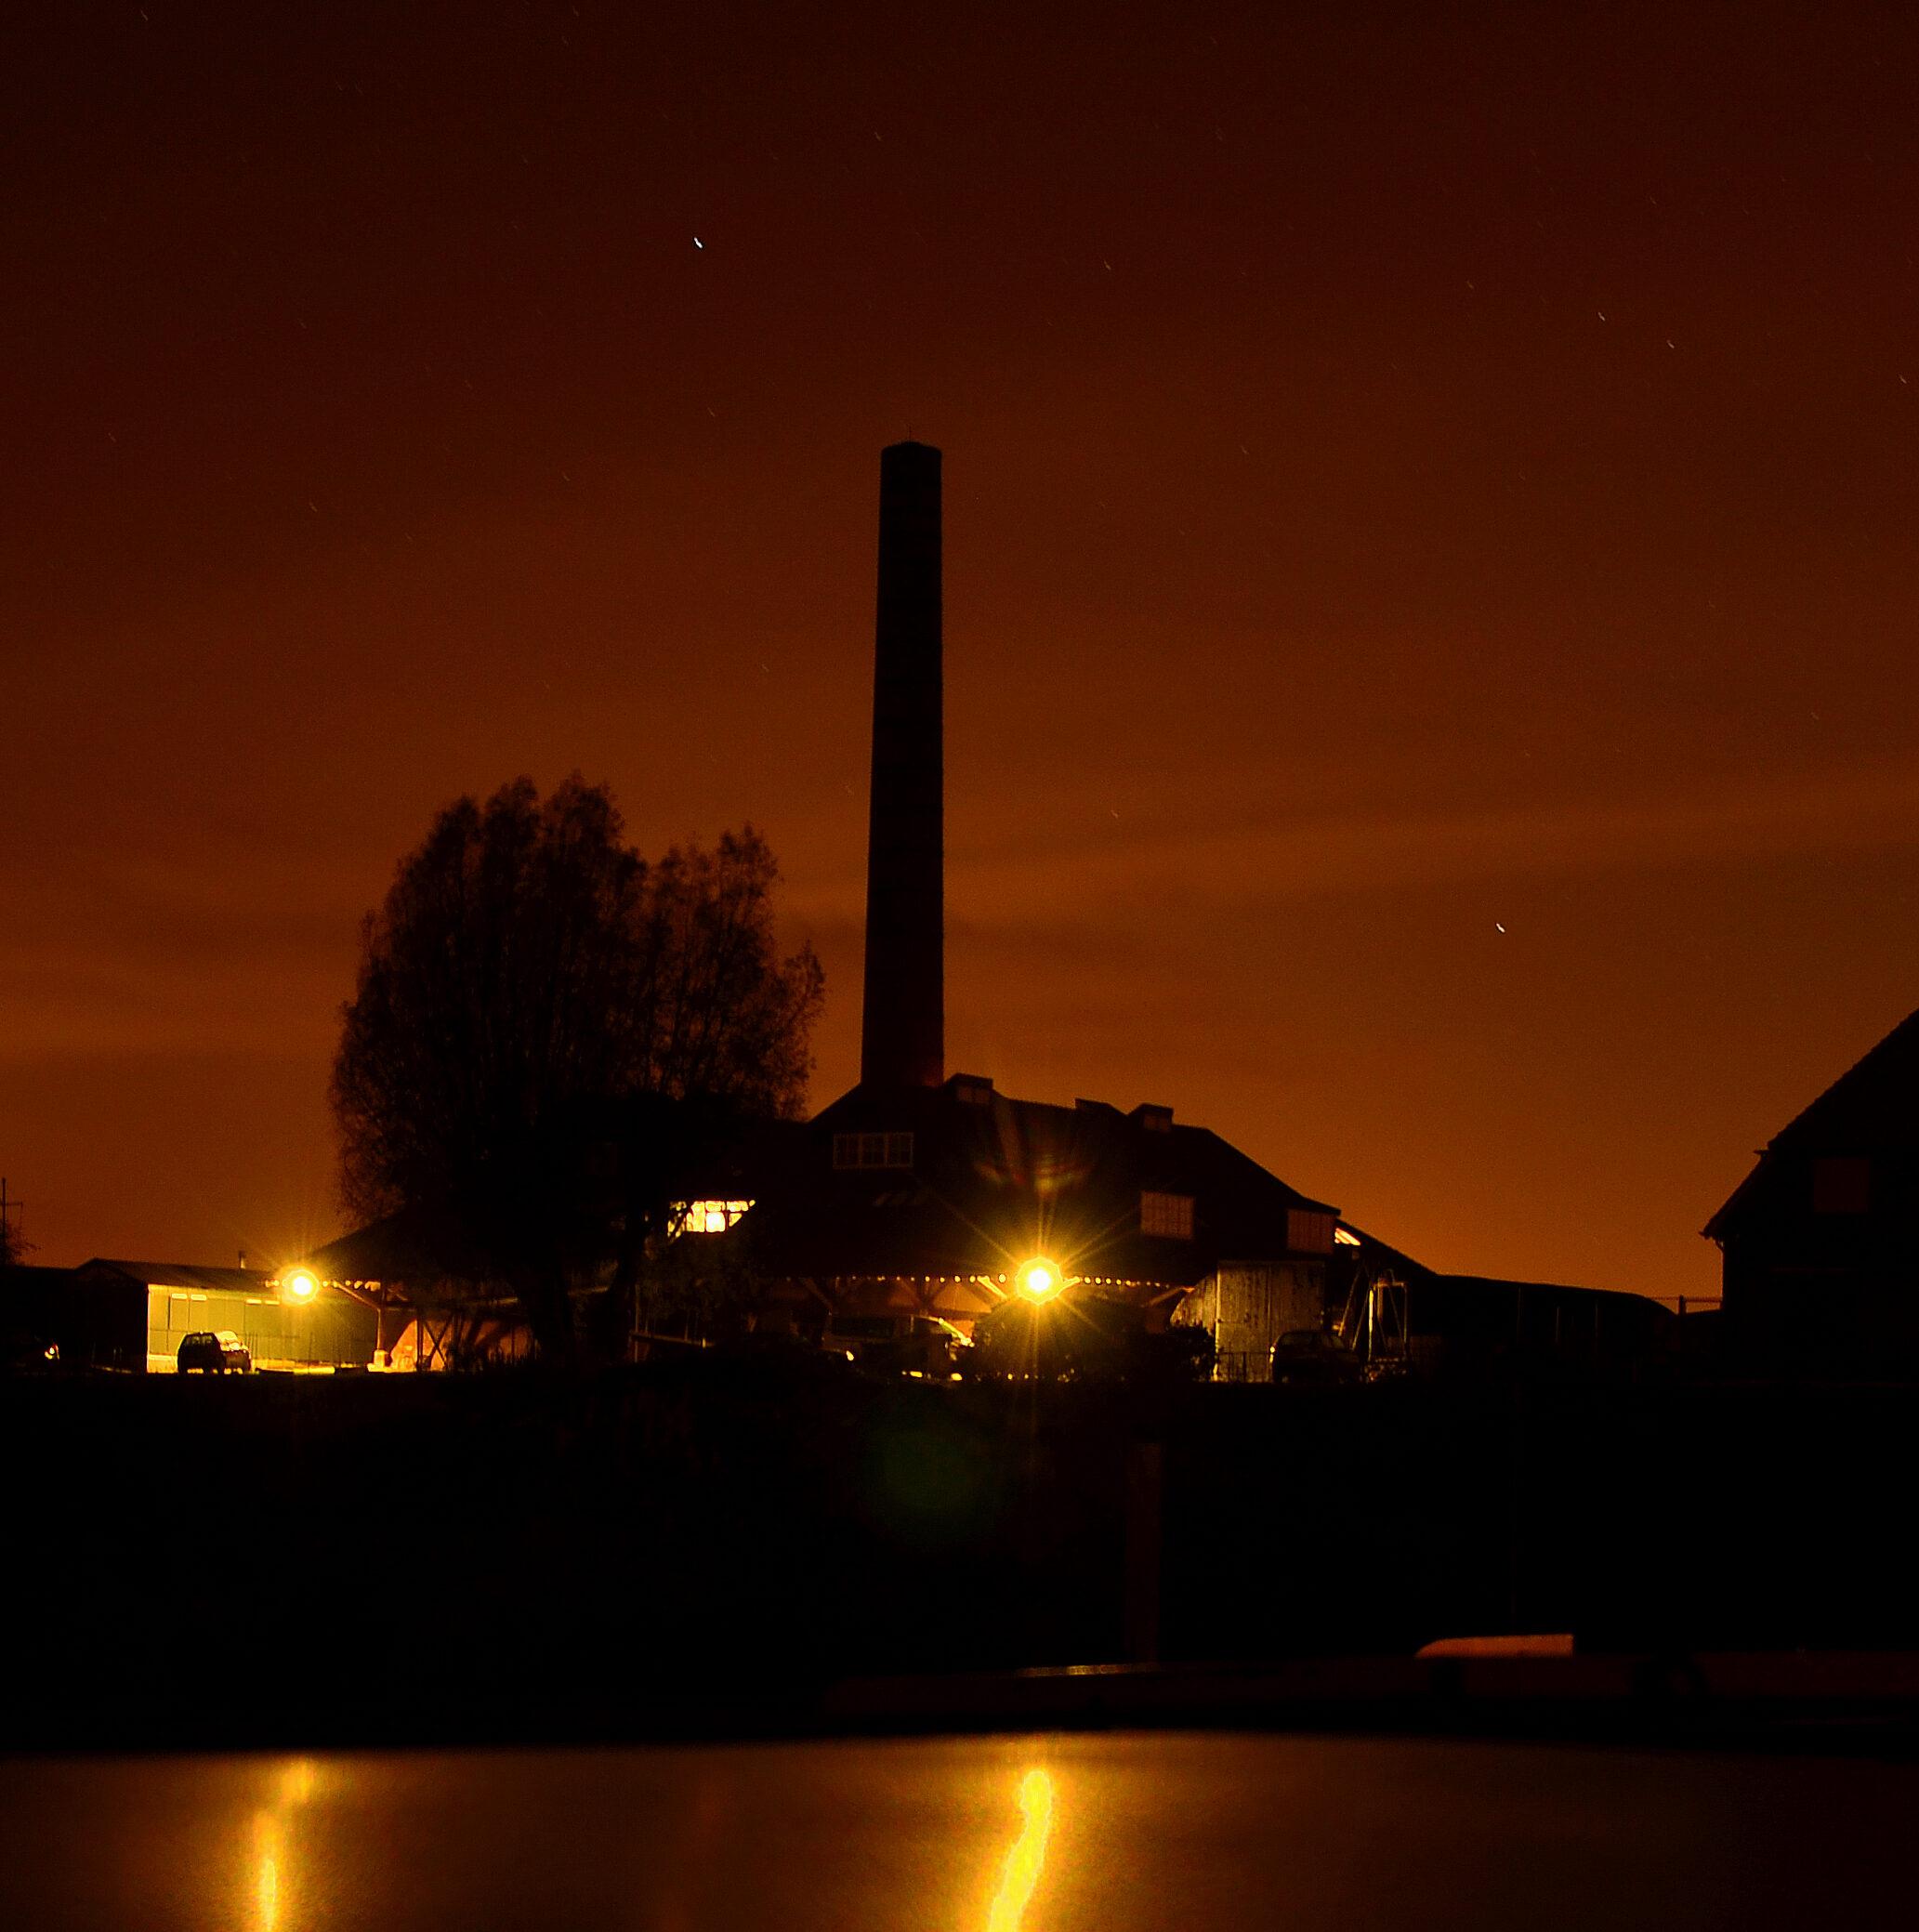 Steenfabriek in de nacht